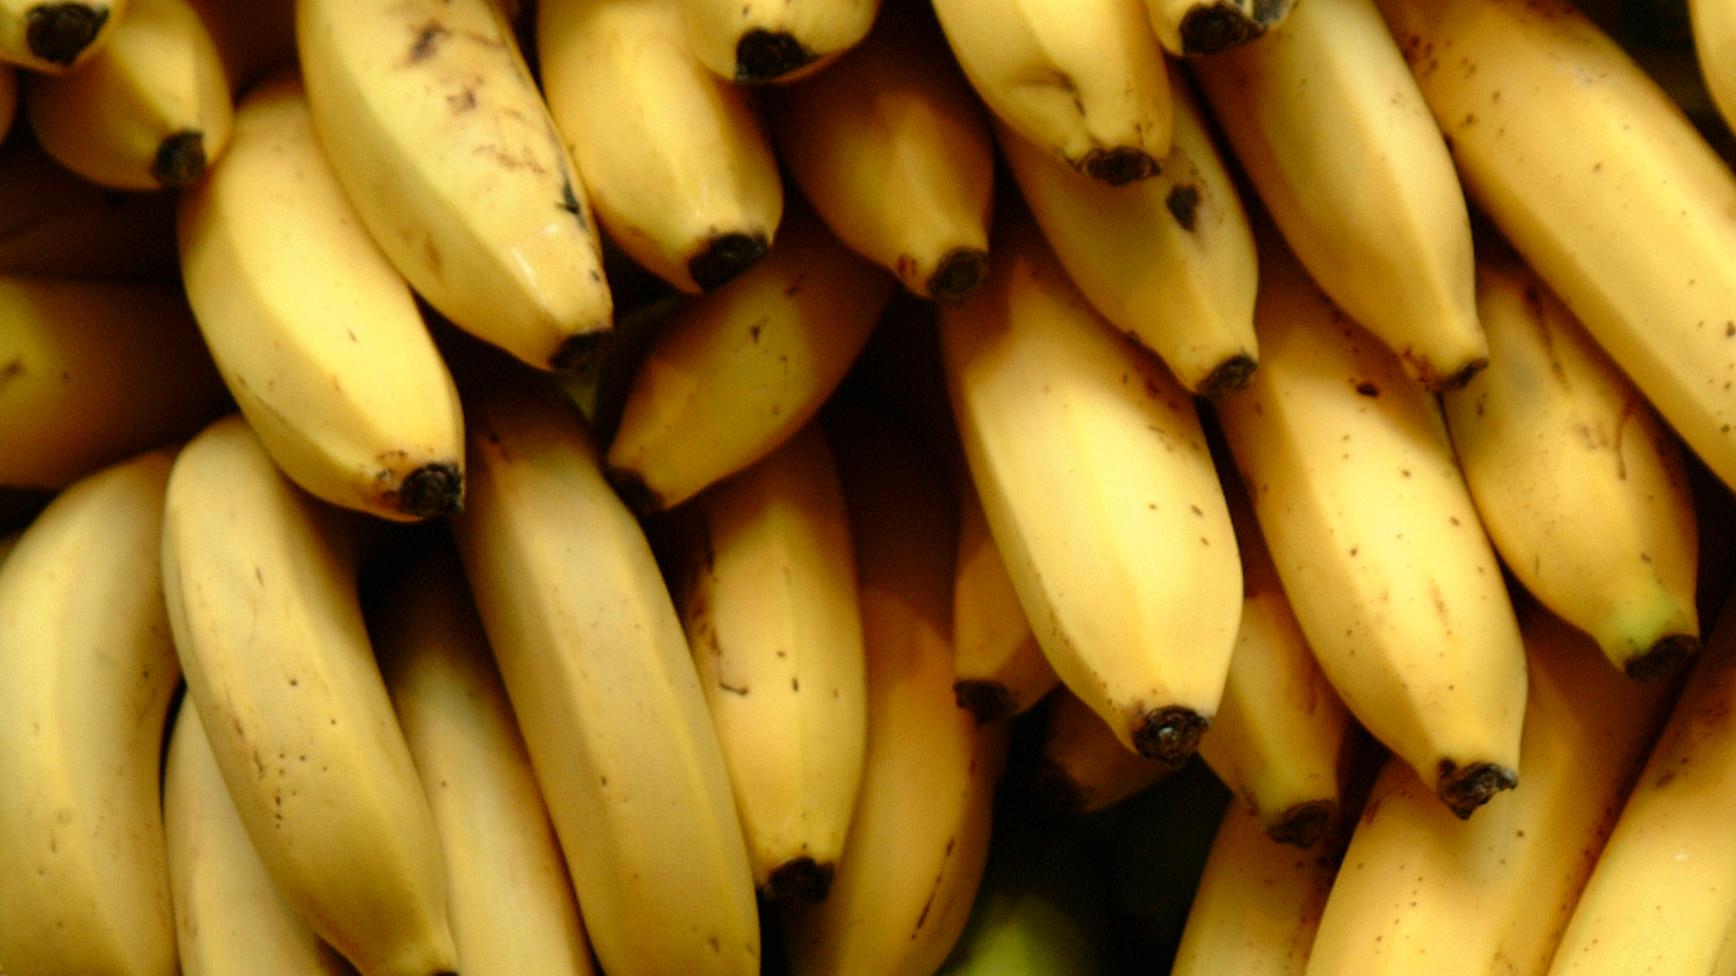 A new kind of banana.